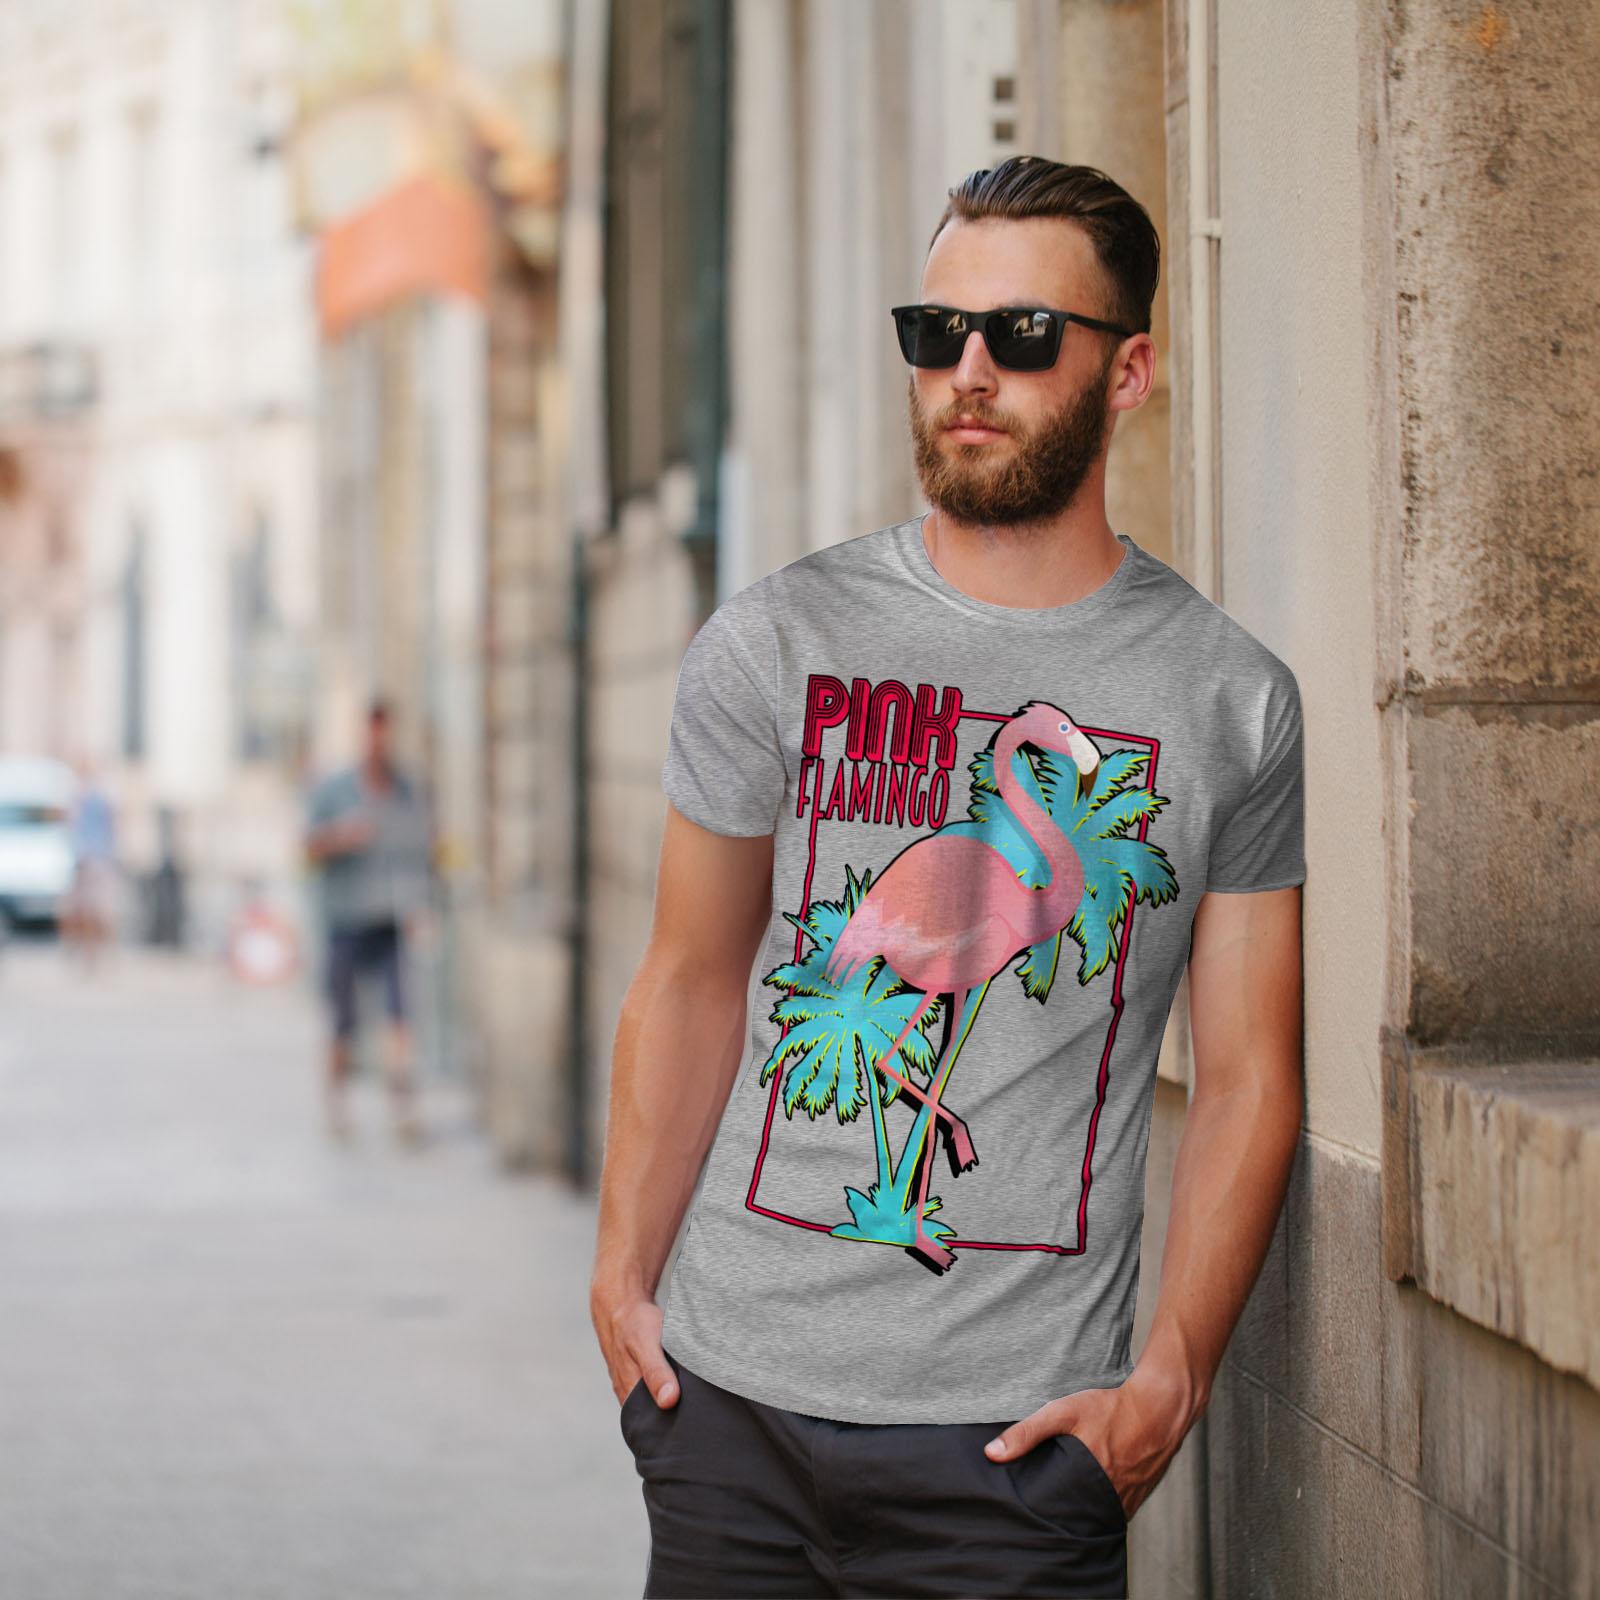 Wellcoda Rosa Flamingo Island Da Uomo T-shirt Tropicale design grafico stampato T-shirt